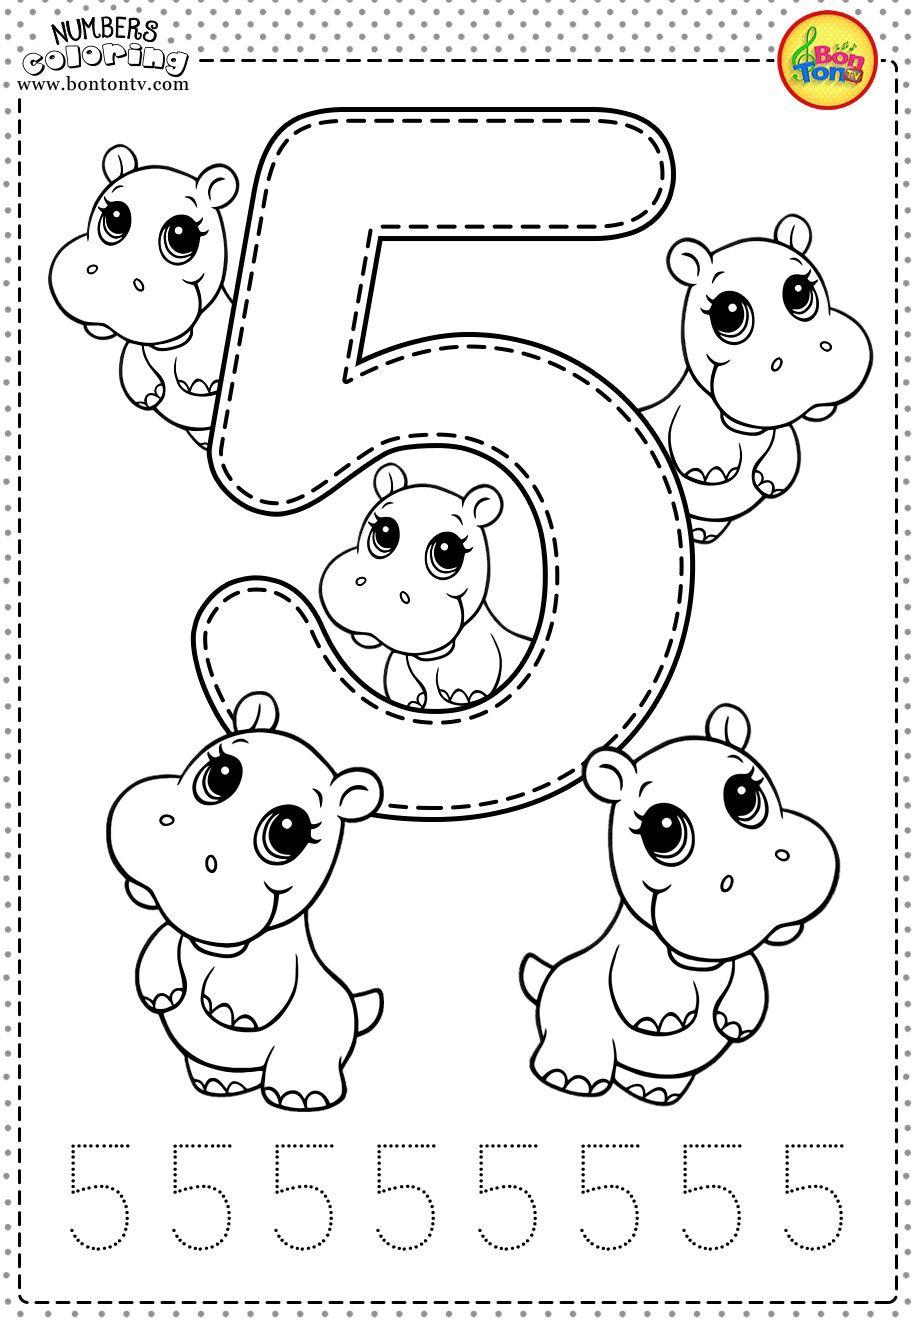 2 Number 8 Worksheet Kindergarten Number 5 Preschool Printables Free Works In 2020 Free Preschool Printables Kids Learning Numbers Preschool Worksheets Free Printables